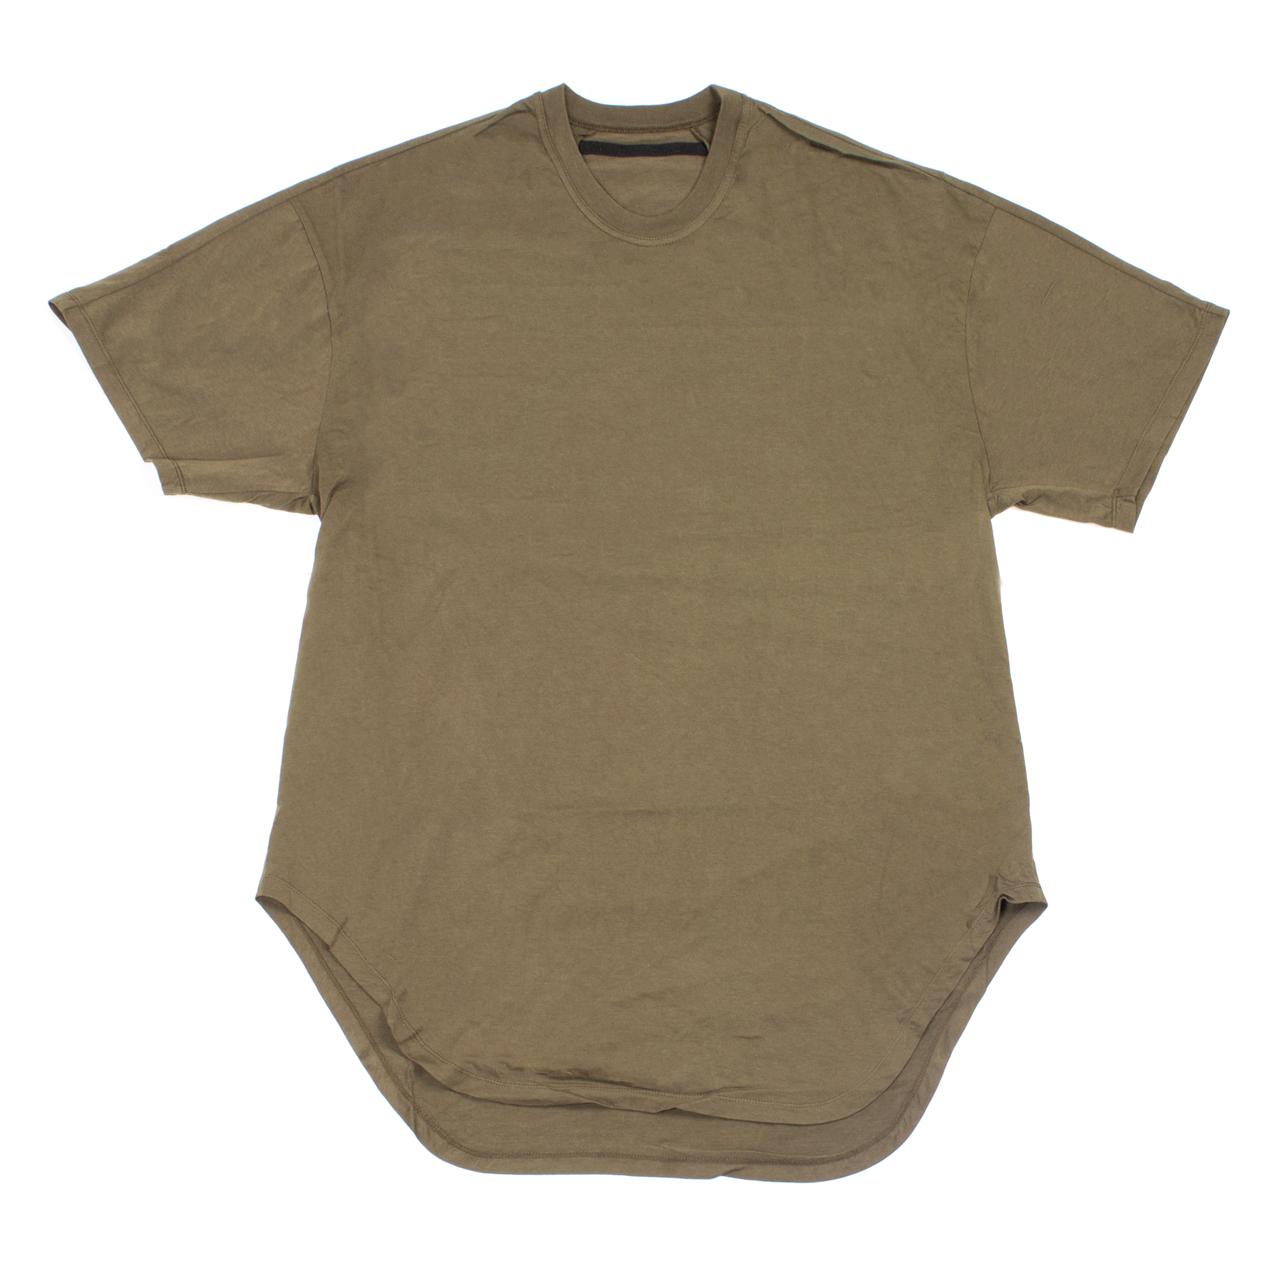 727CUM7-BROWN / オーバーサイズ Tシャツ